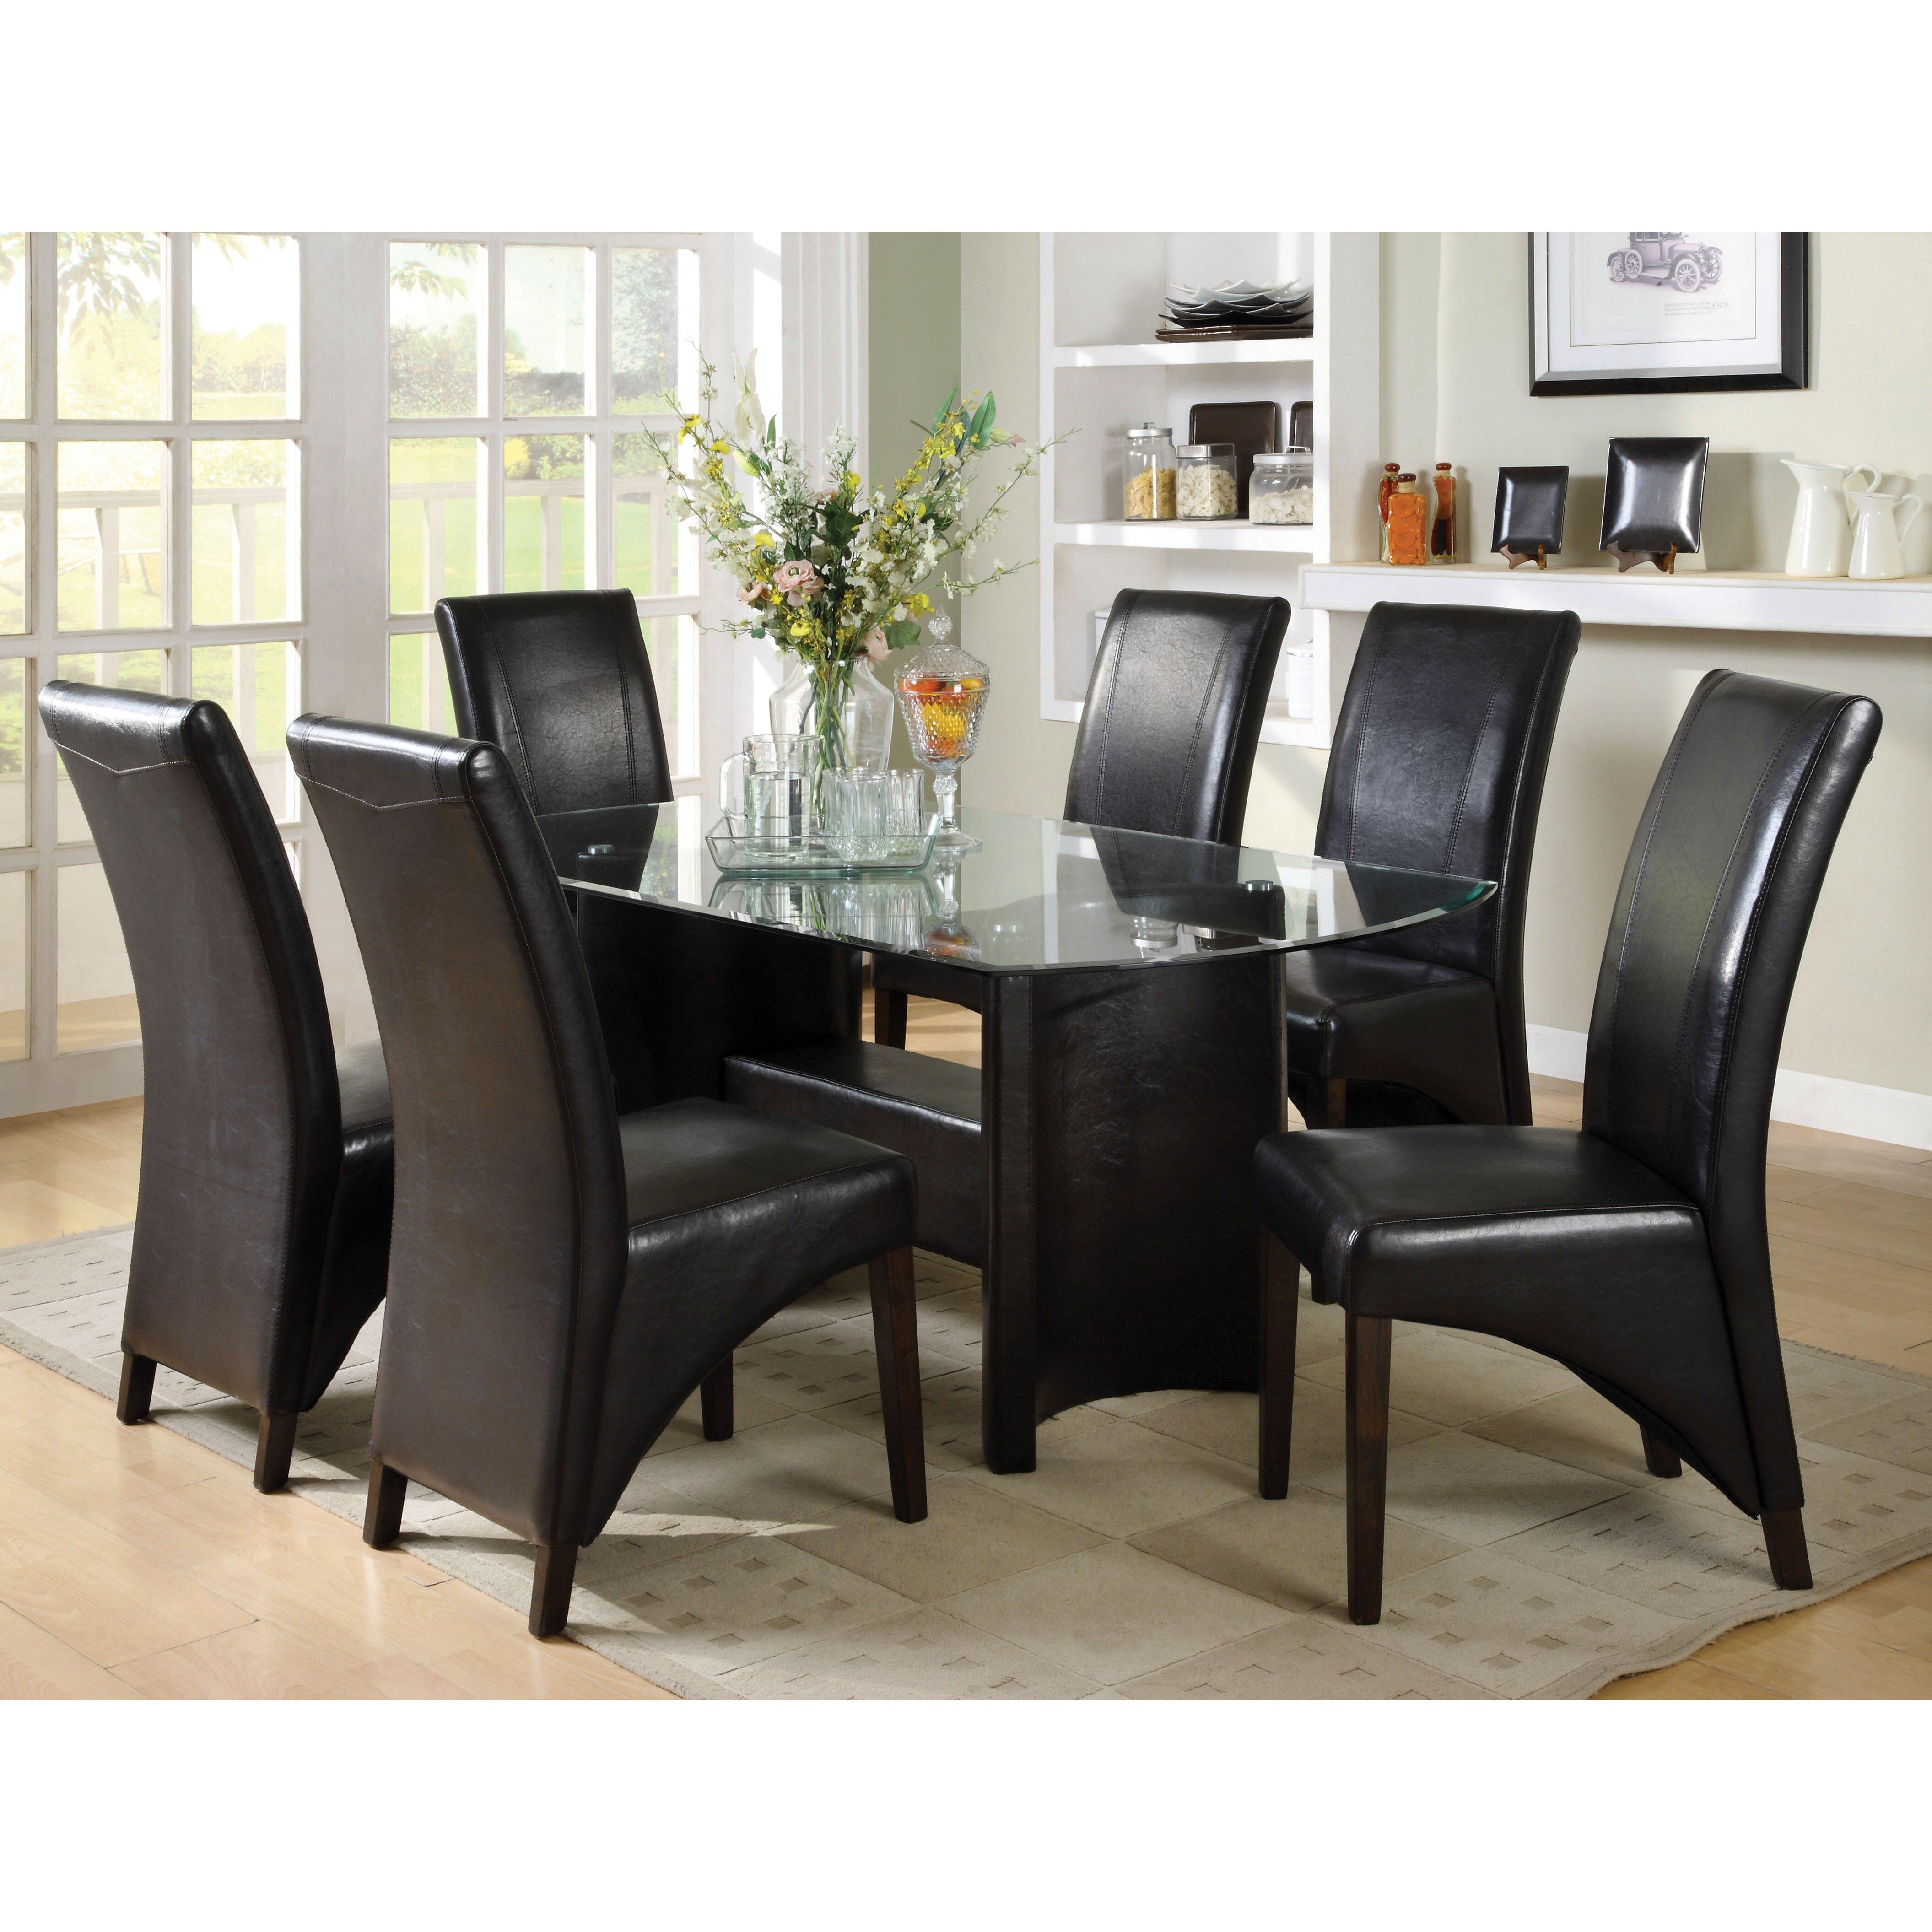 Hokku designs madison dining table reviews wayfair for Hokku designs dining room furniture